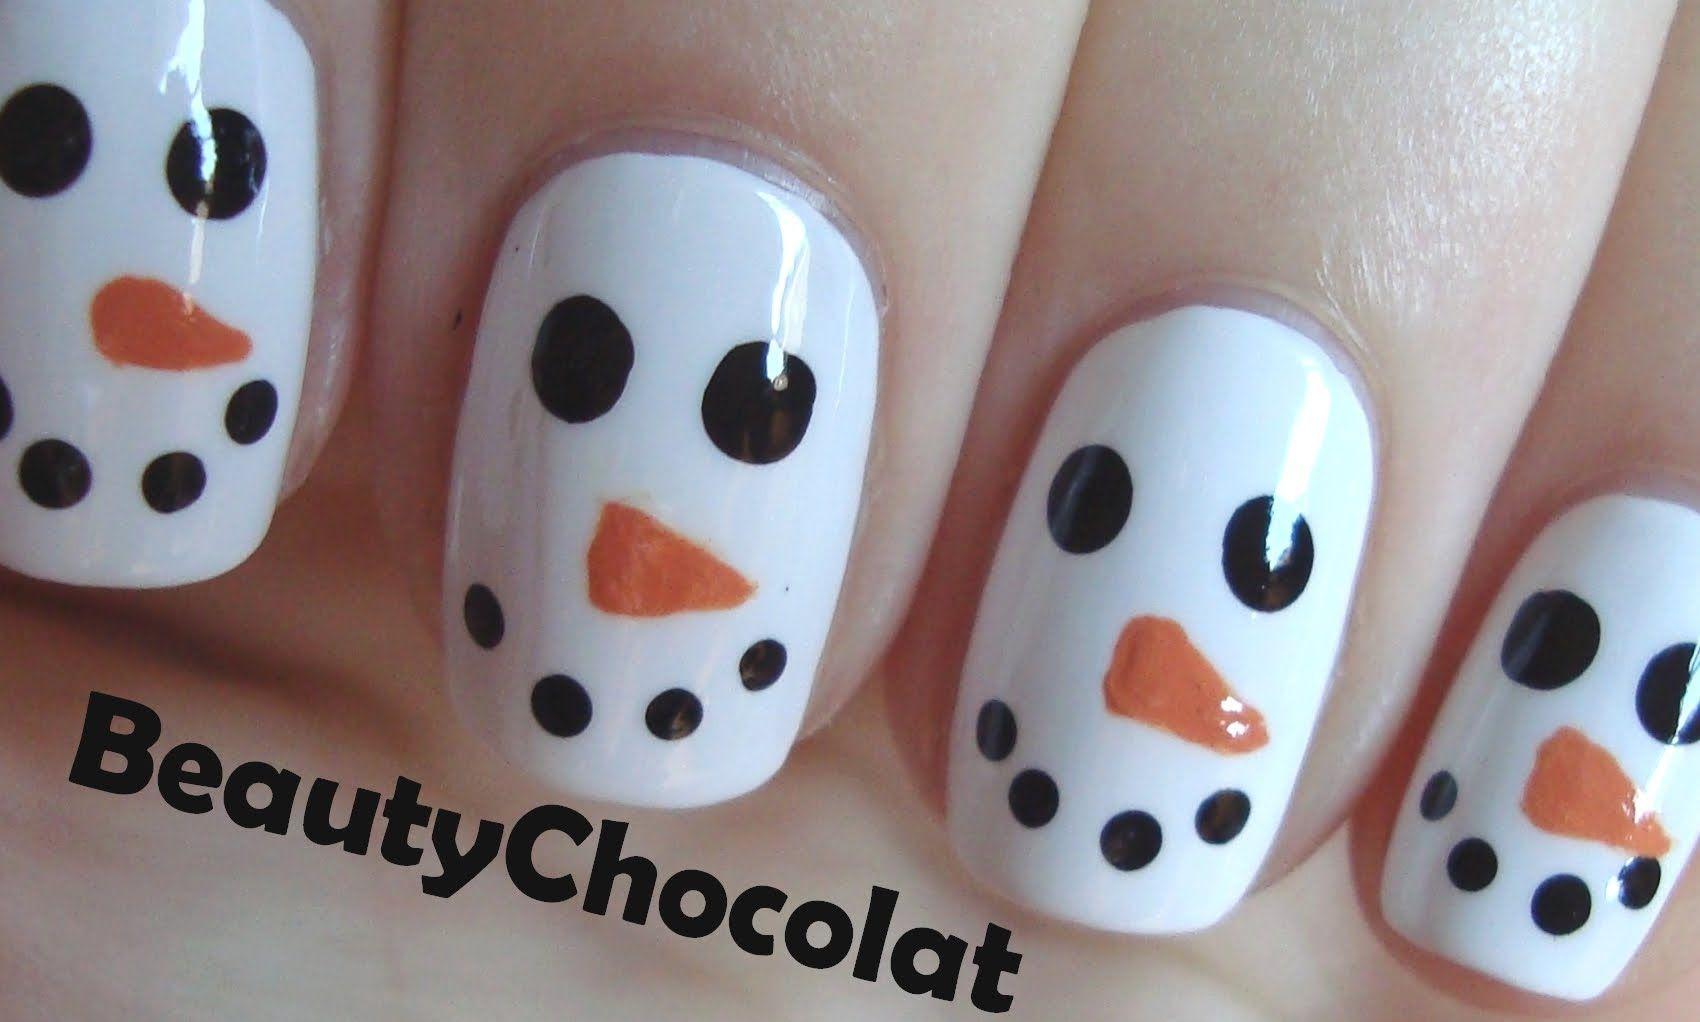 Maxresdefault Jpg 1700 1022 Christmas Nails Easy Snowman Nail Art Nails For Kids